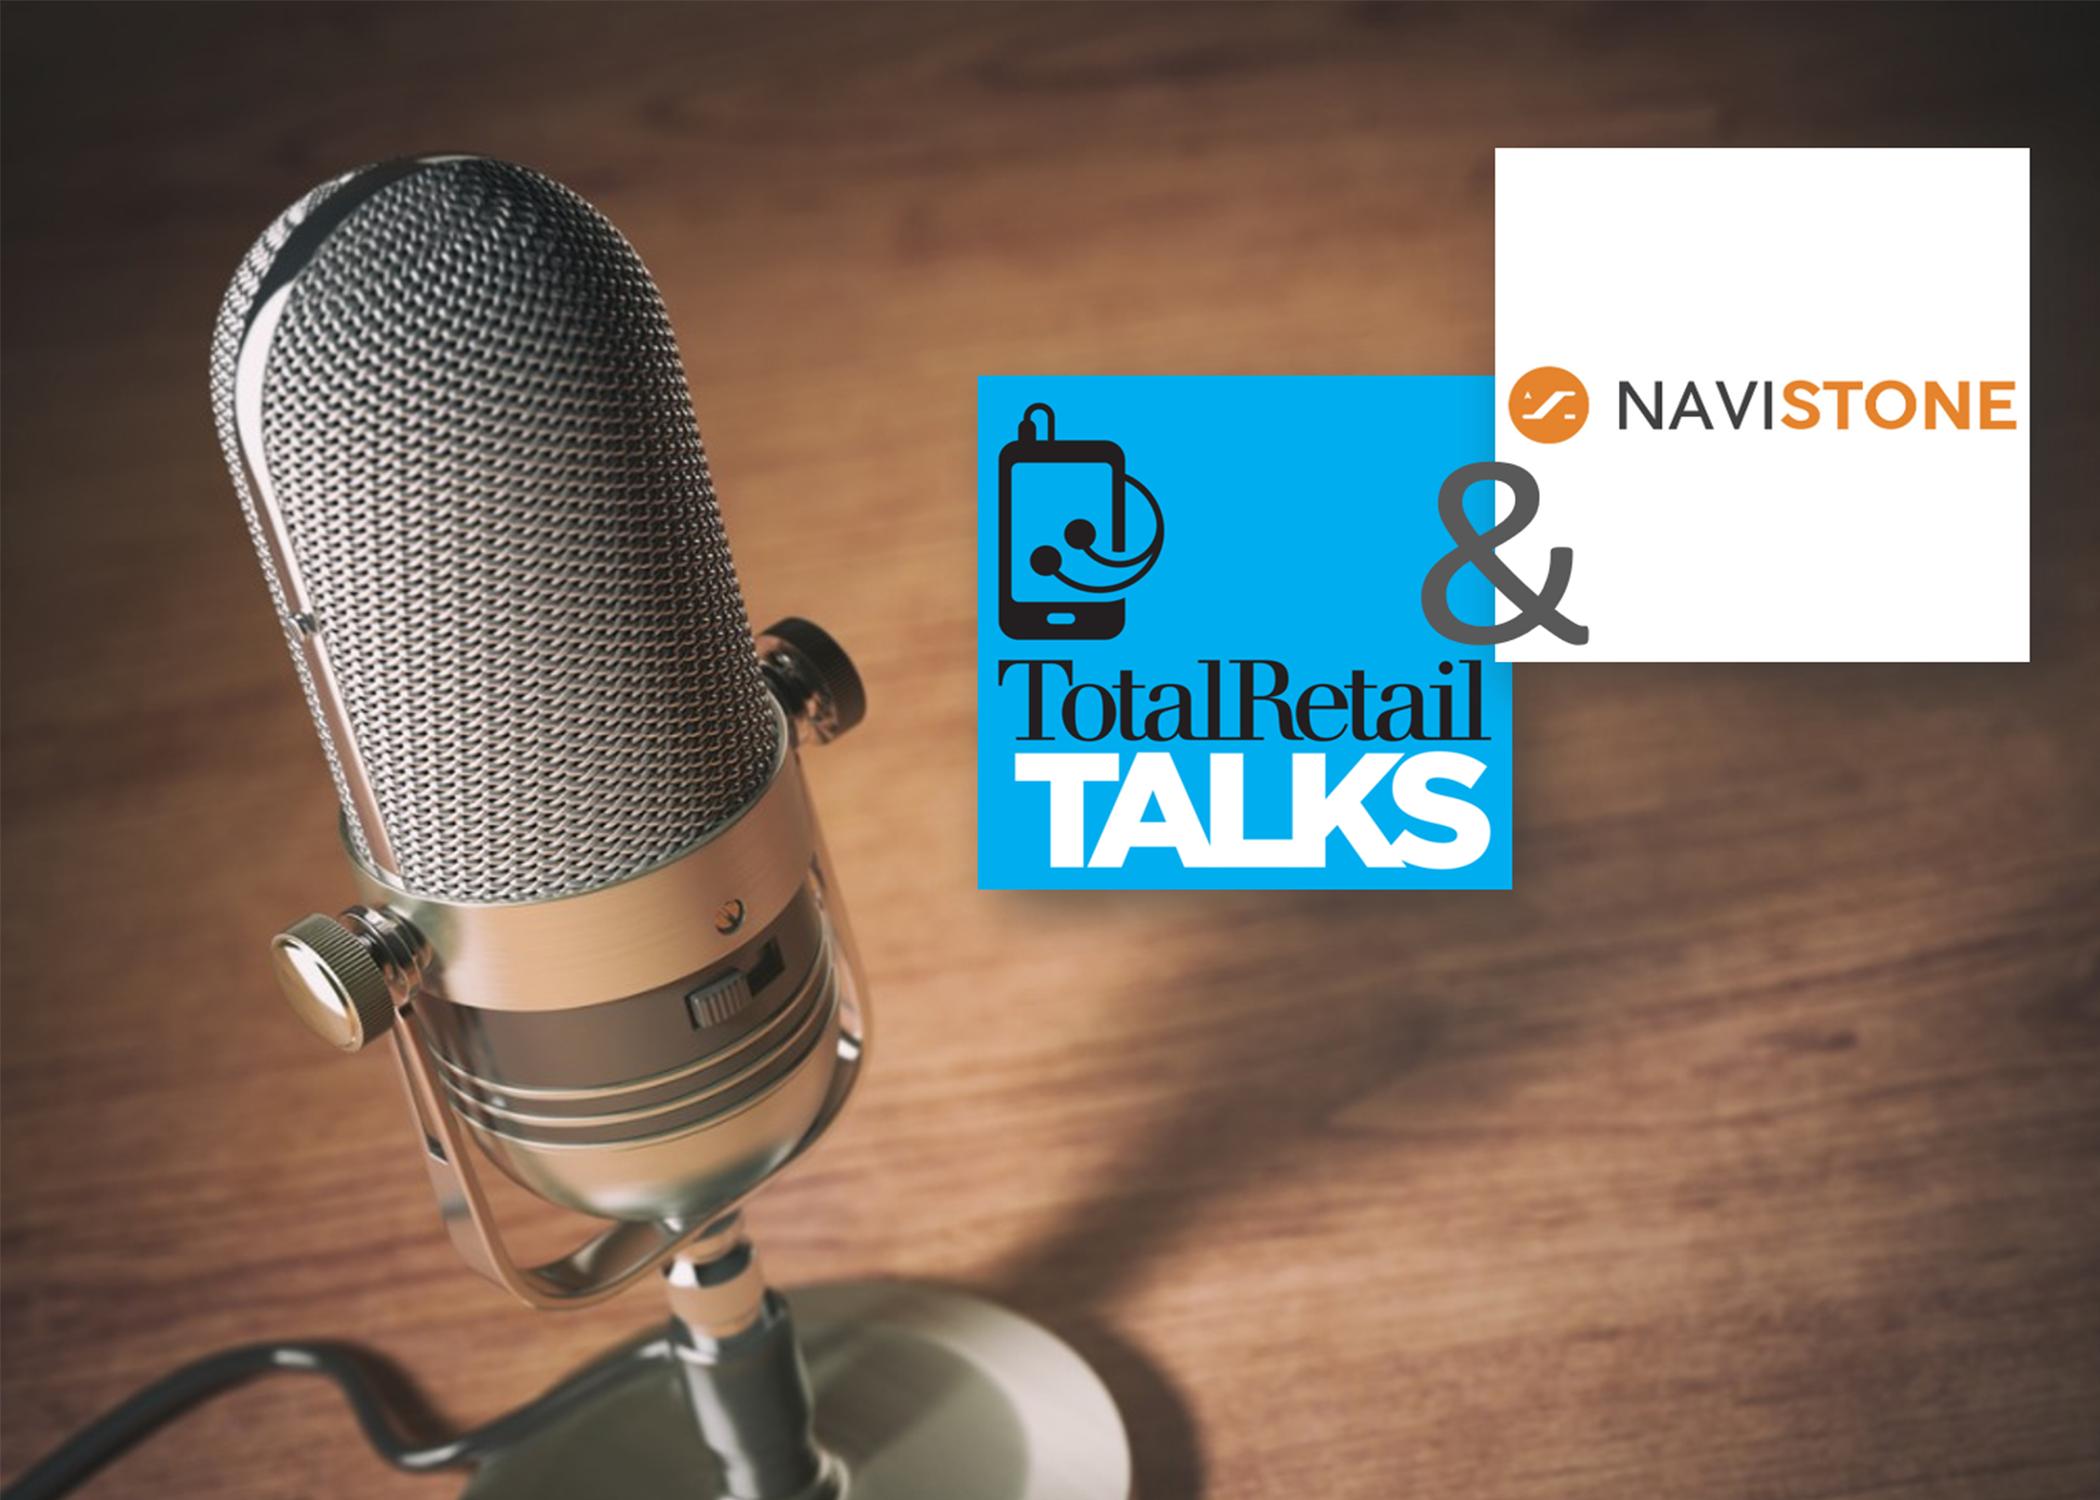 Getting To Know NaviStone